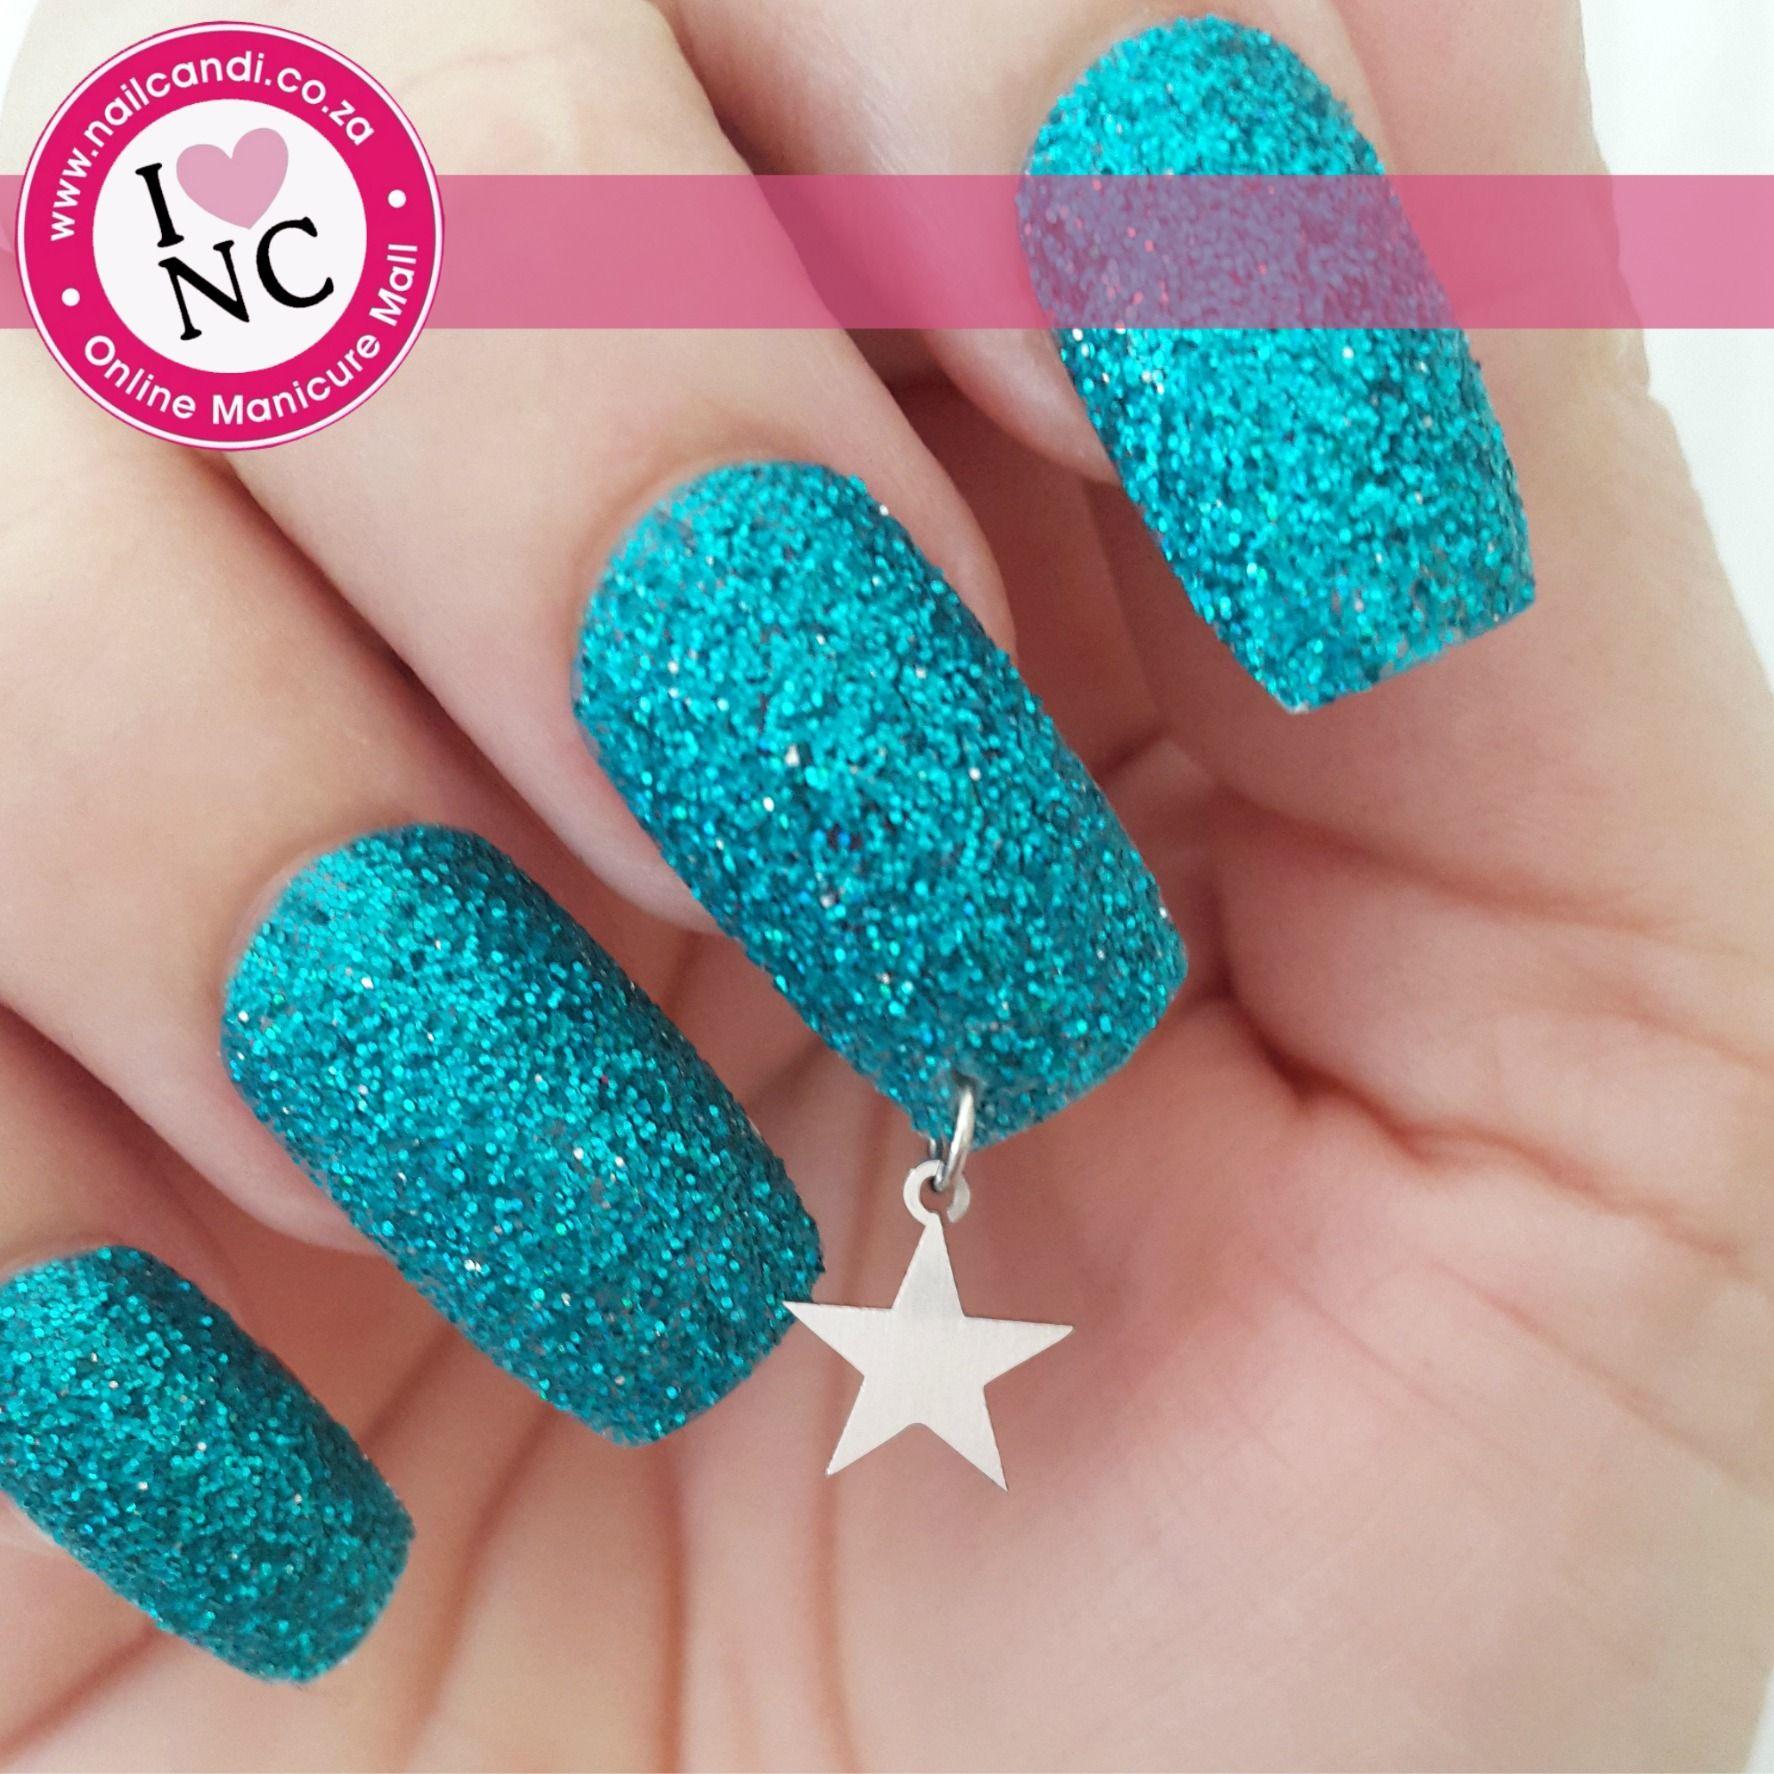 Piercings and Dangles - Star charm | NailCandi Piercings & Dangles ...